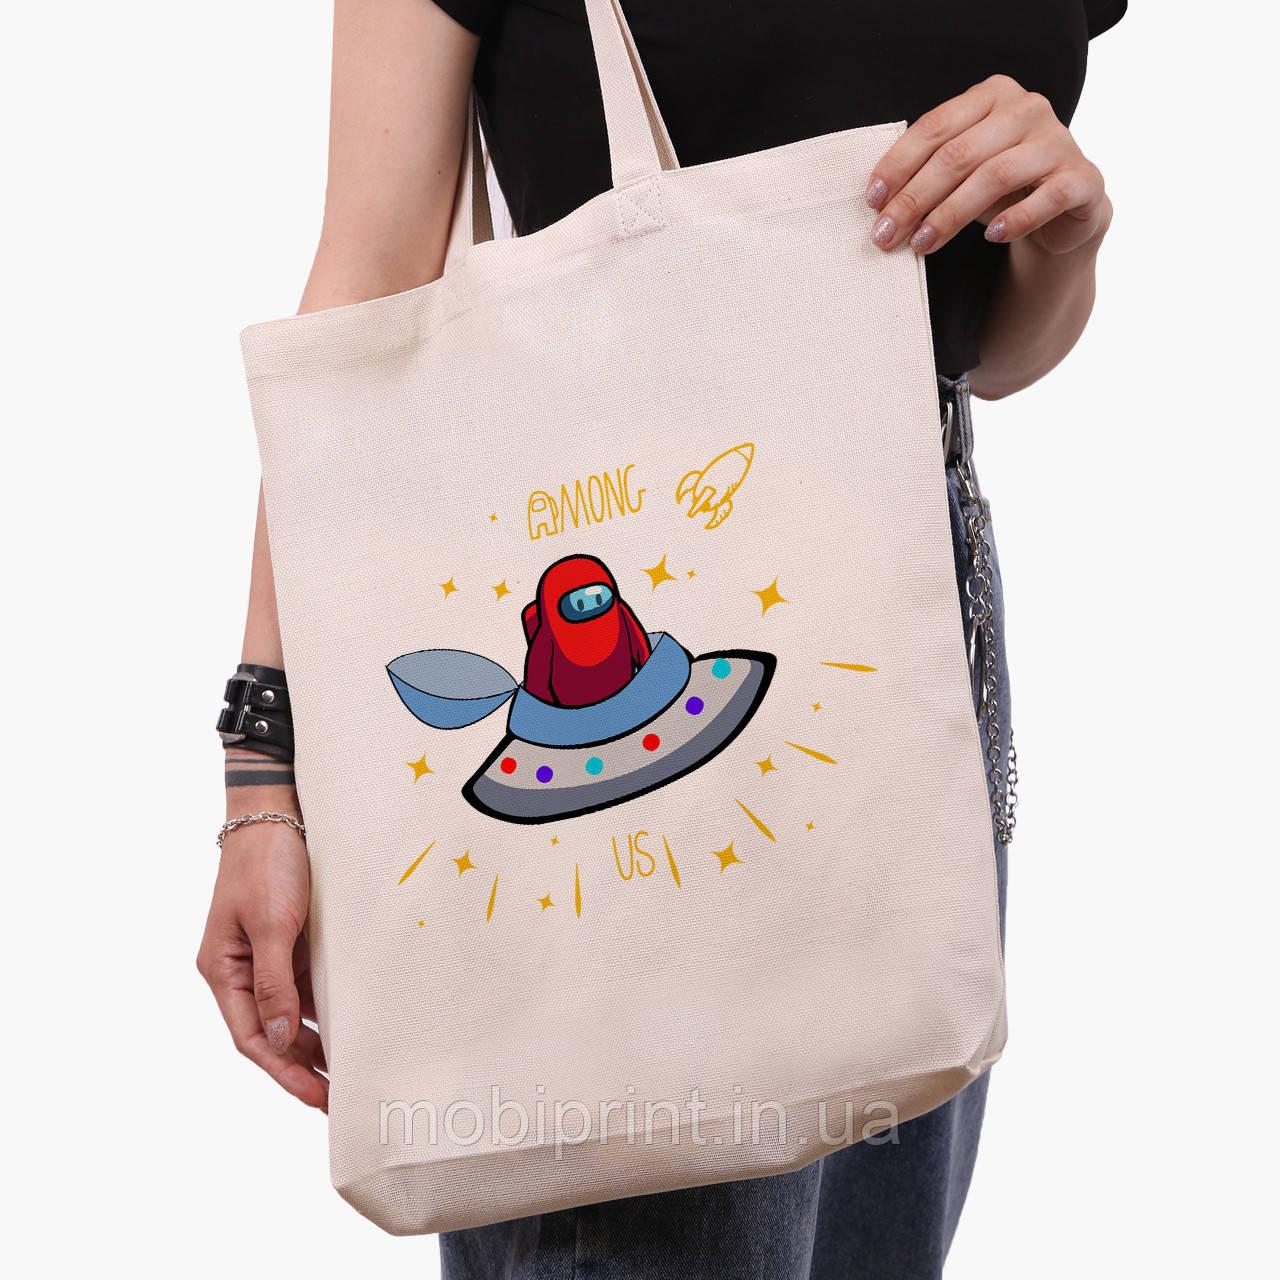 Еко сумка шоппер біла Амонг Ас (Among Us) (9227-2583-1) 41*39*8 см